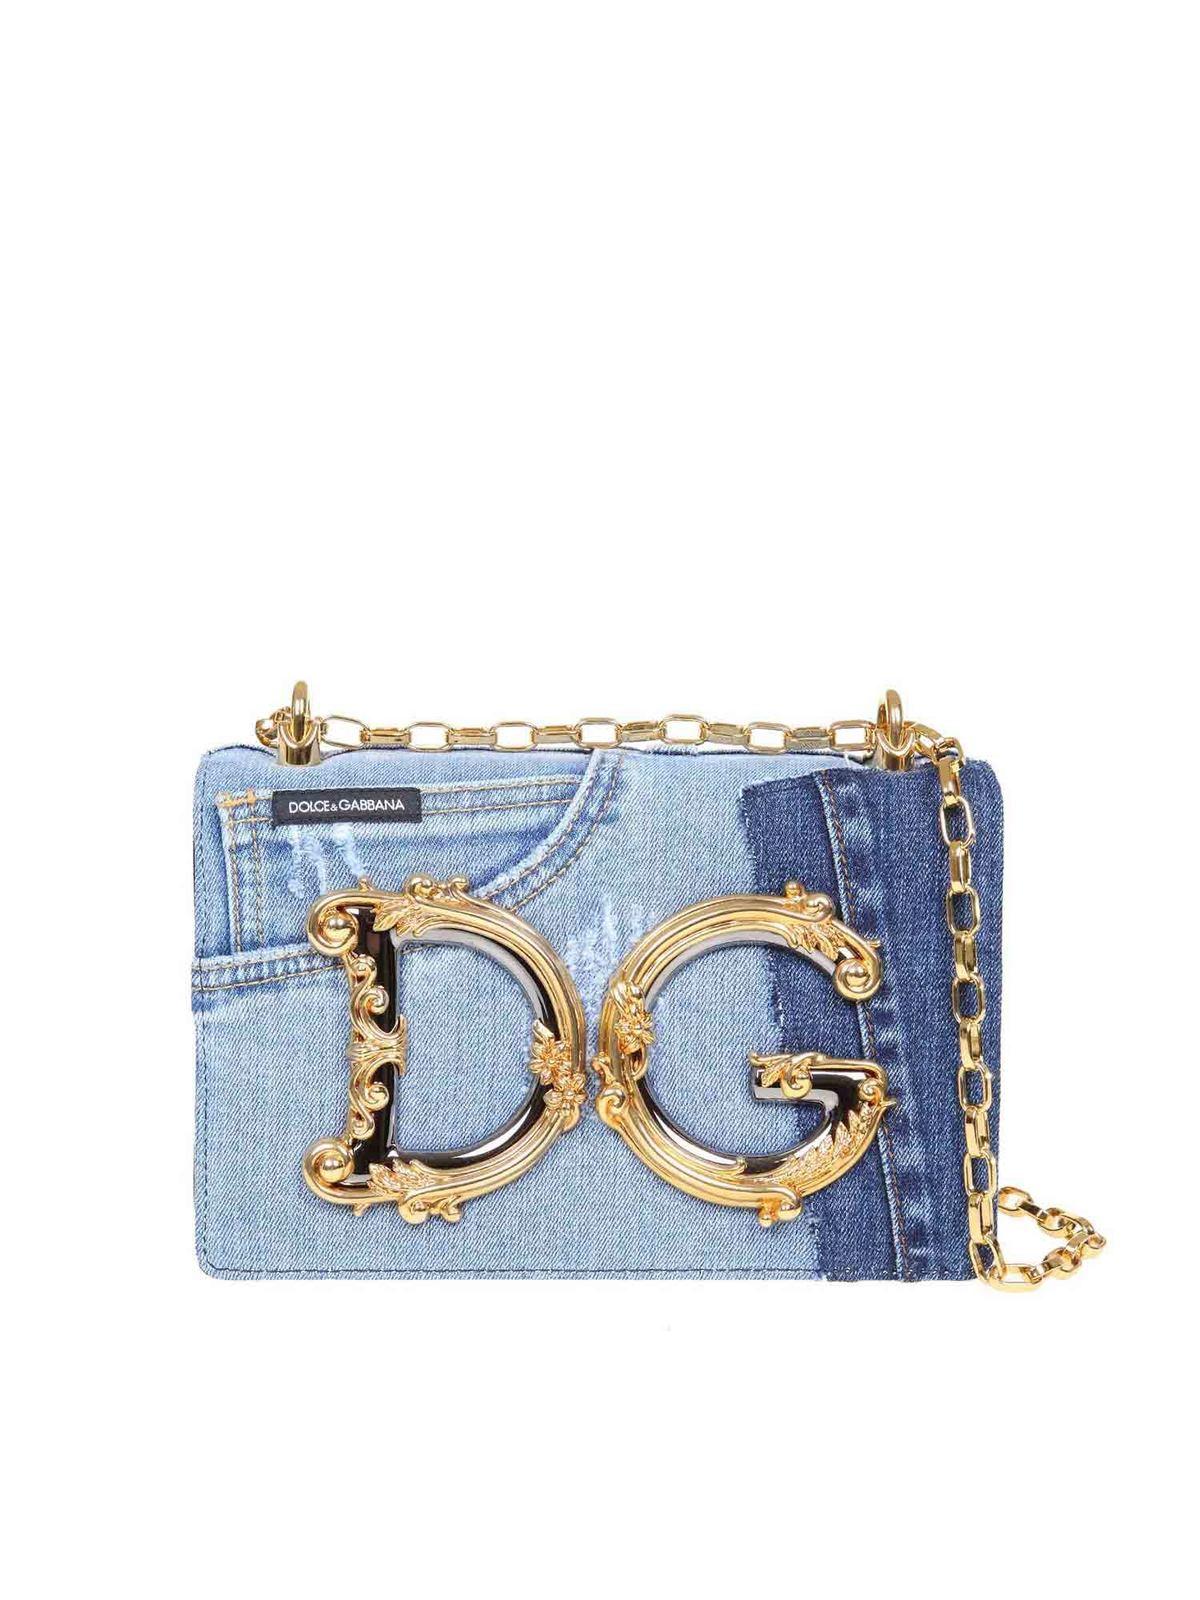 Dolce & Gabbana DG GIRLS DENIM AND LEATHER PATCHWORK BAG